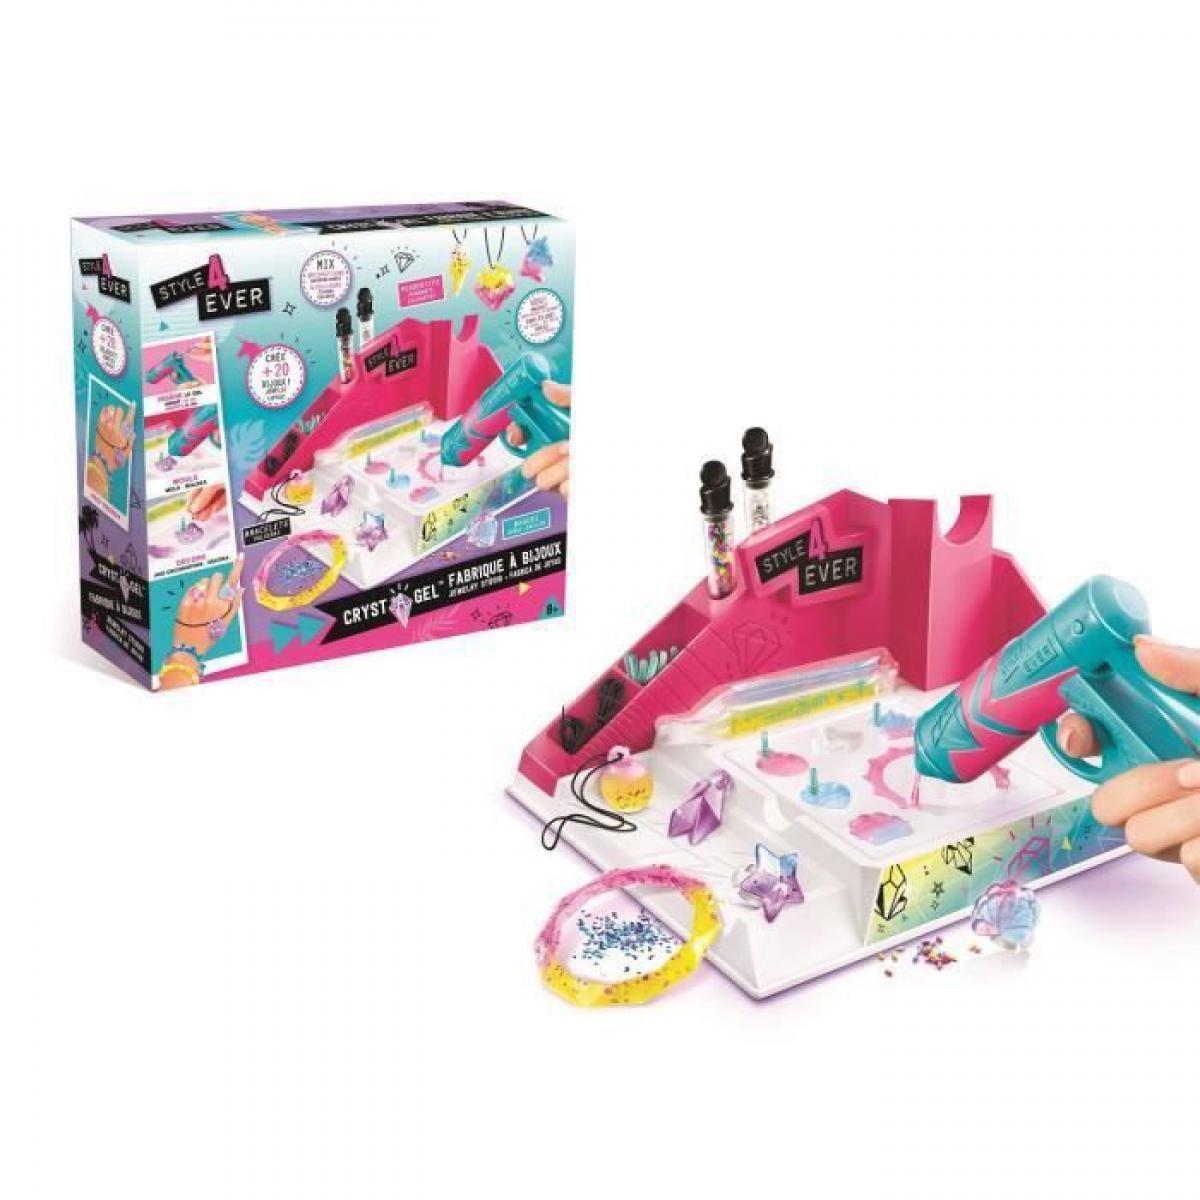 Canal Toys CrystalGel Studio